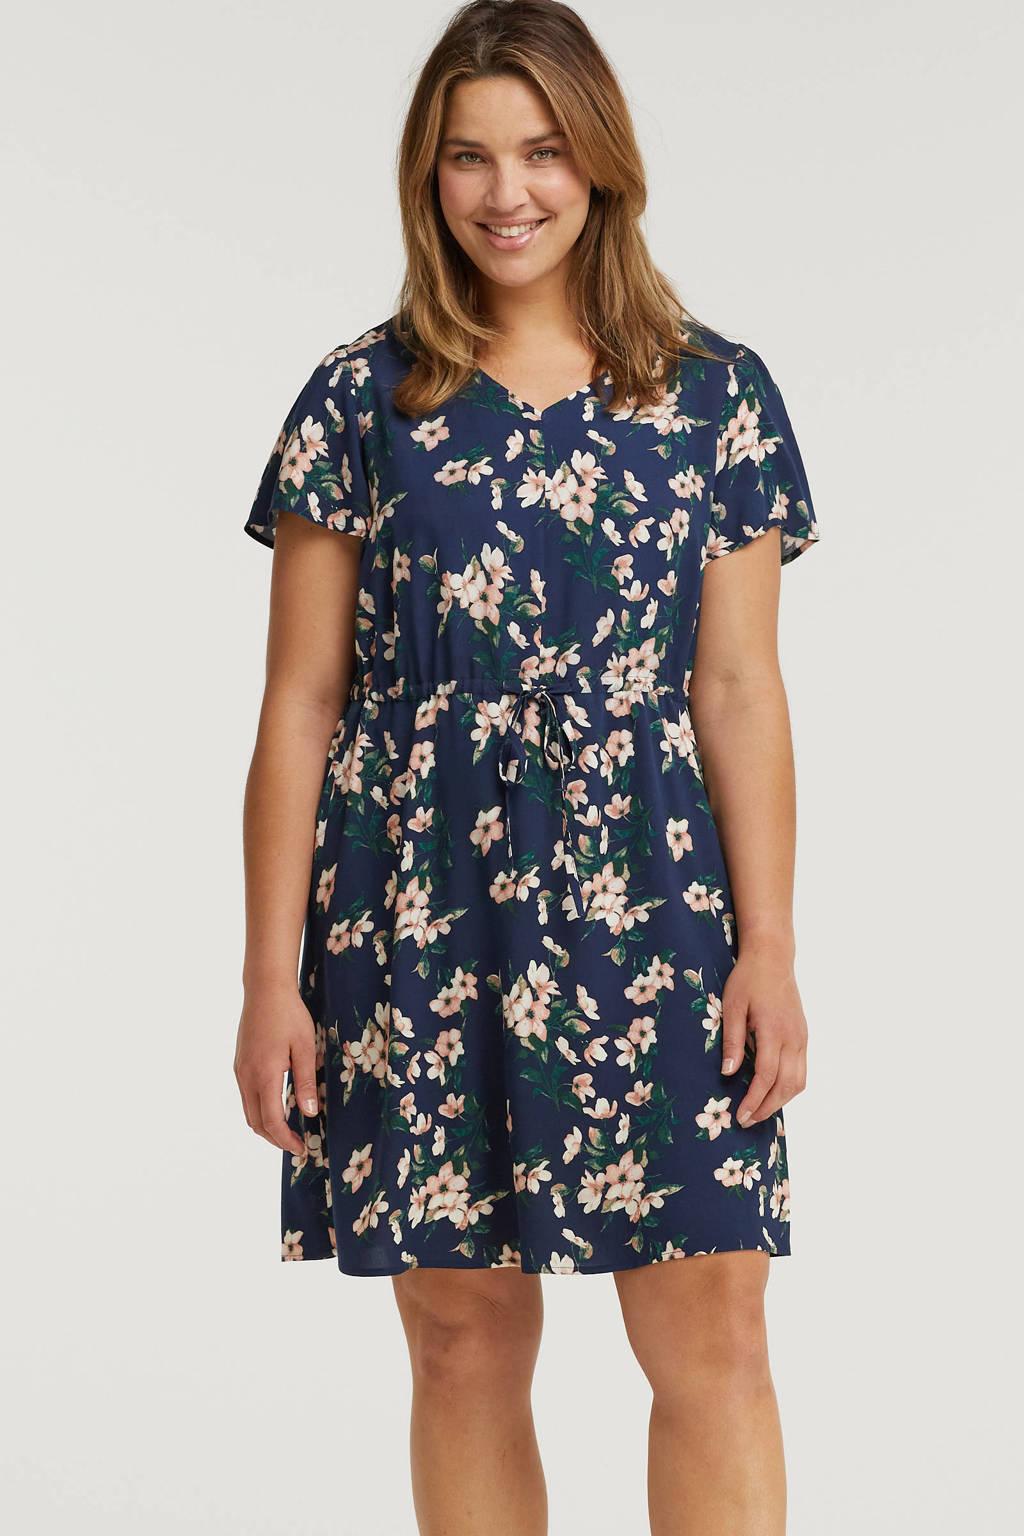 VERO MODA CURVE gebloemde jurk VMSIMPLY donkerblauw/lichtroze/donkergroen, Donkerblauw/lichtroze/donkergroen